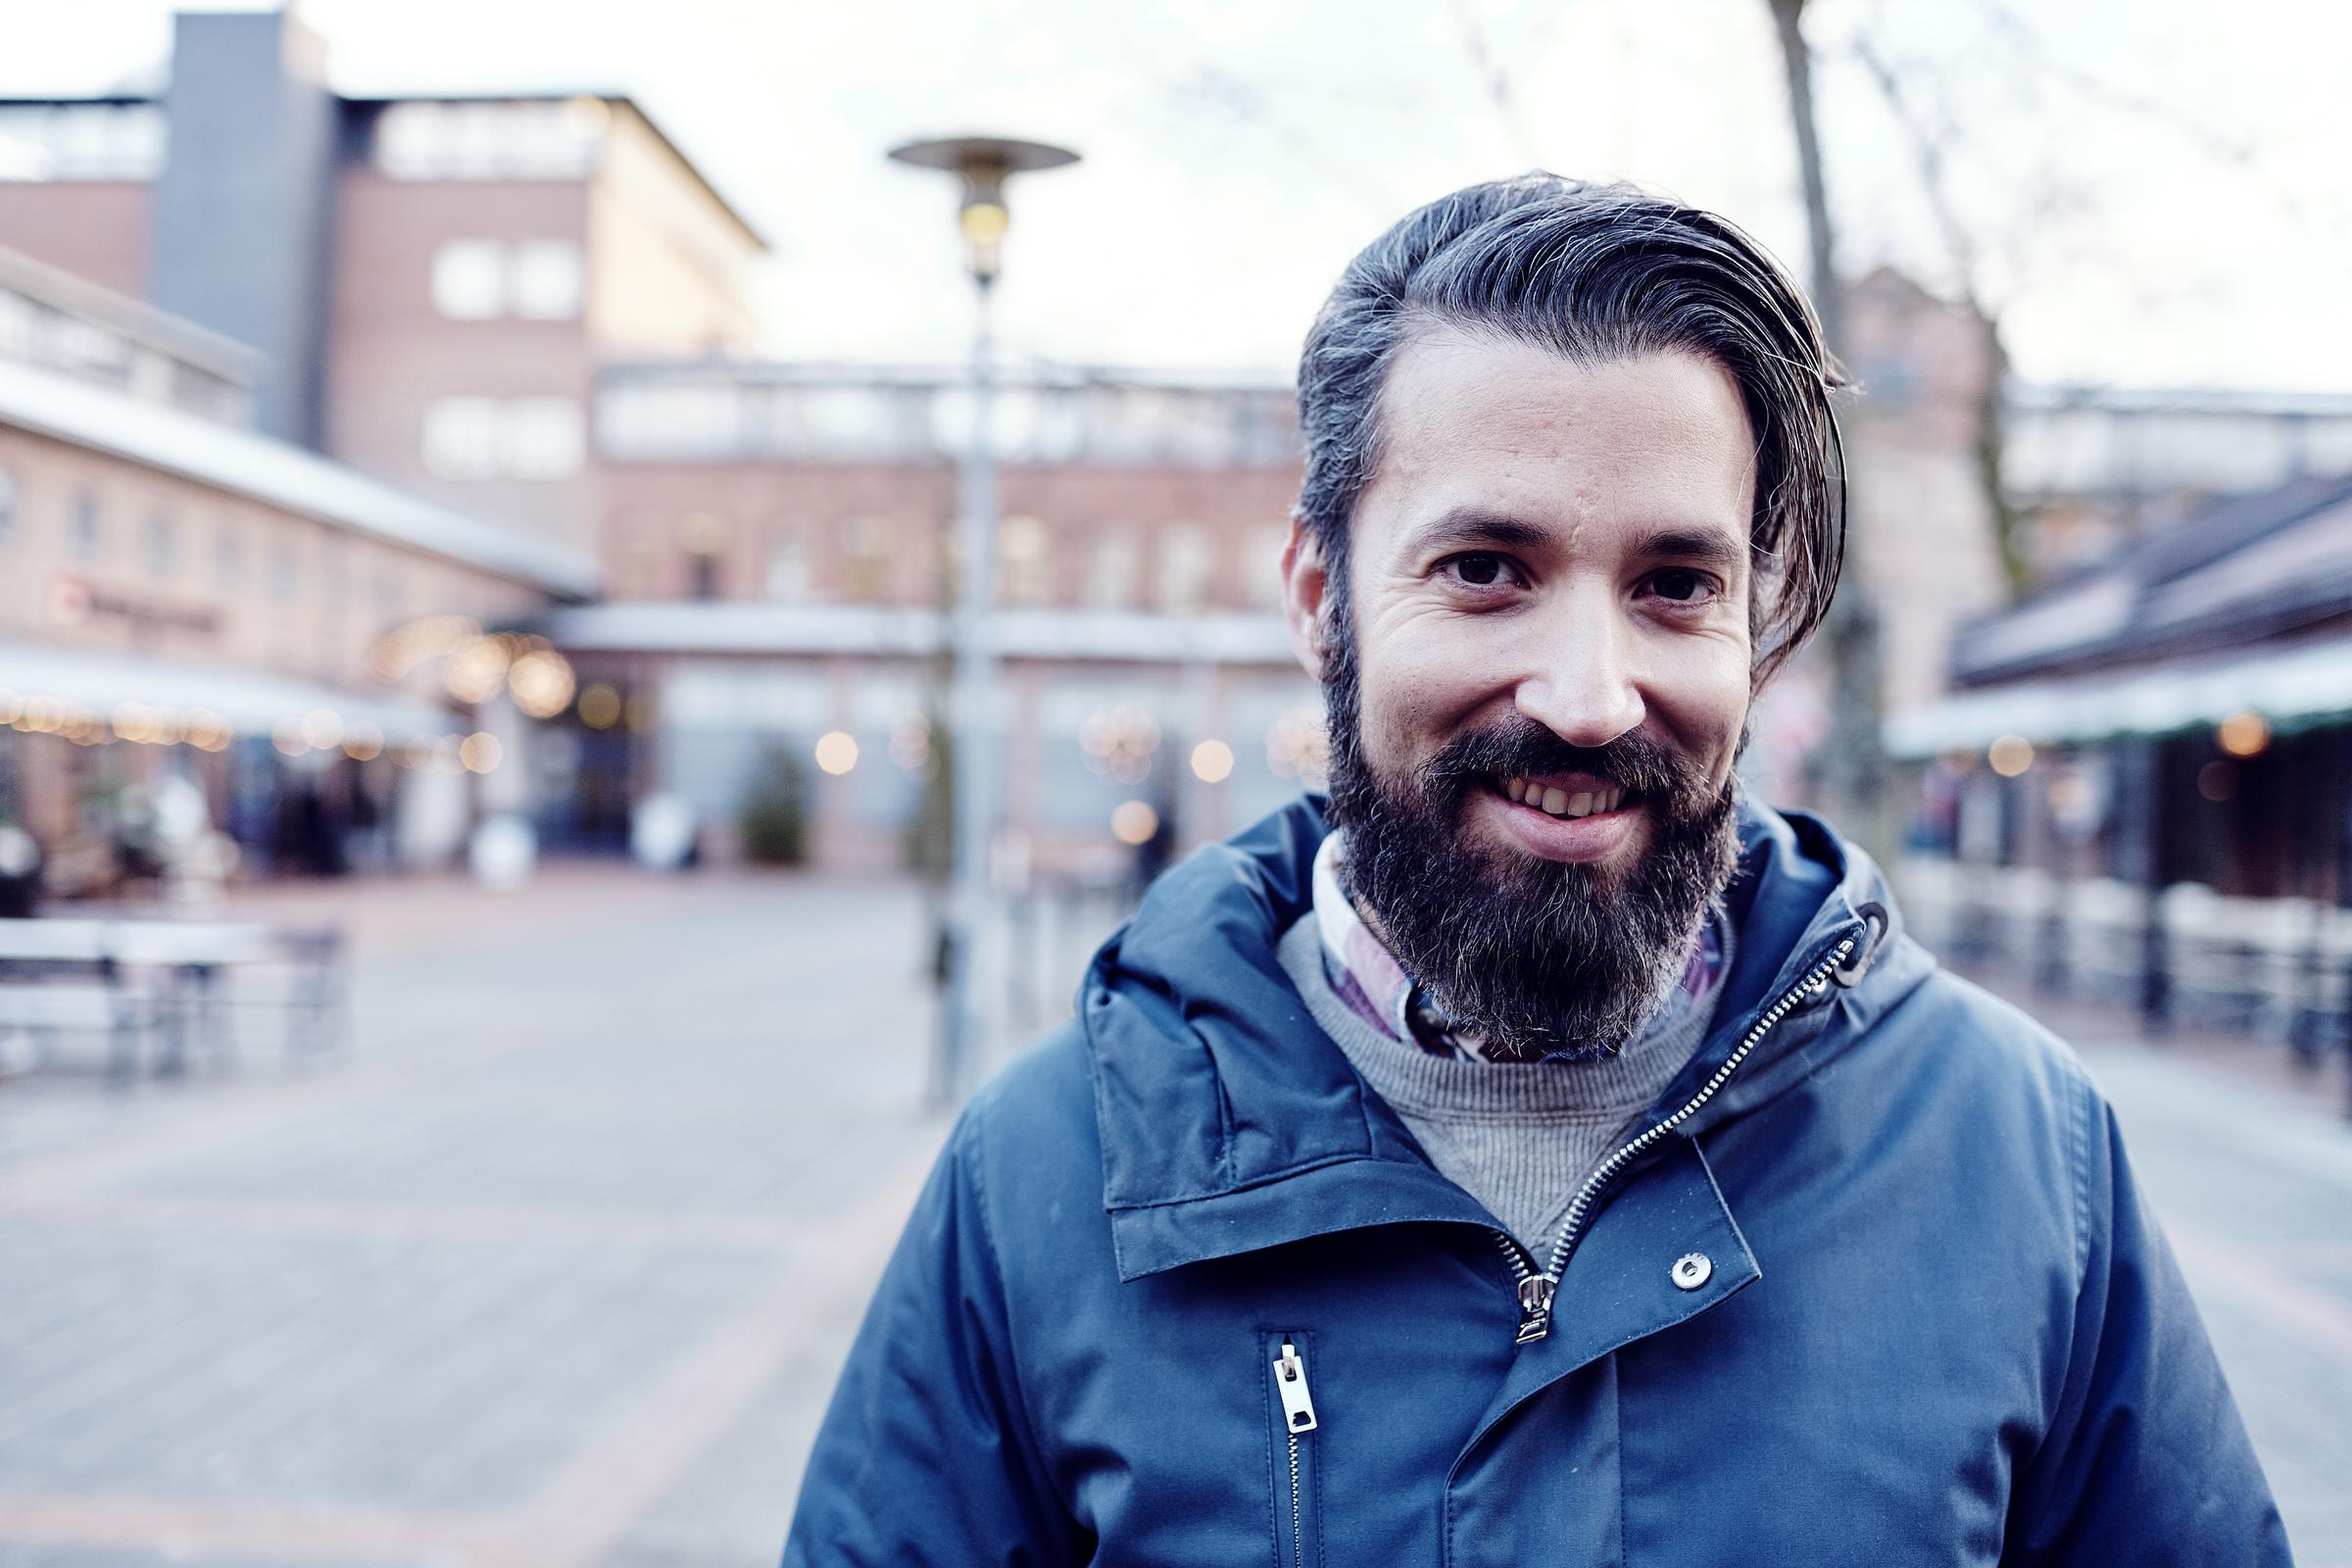 Smiling man at a square